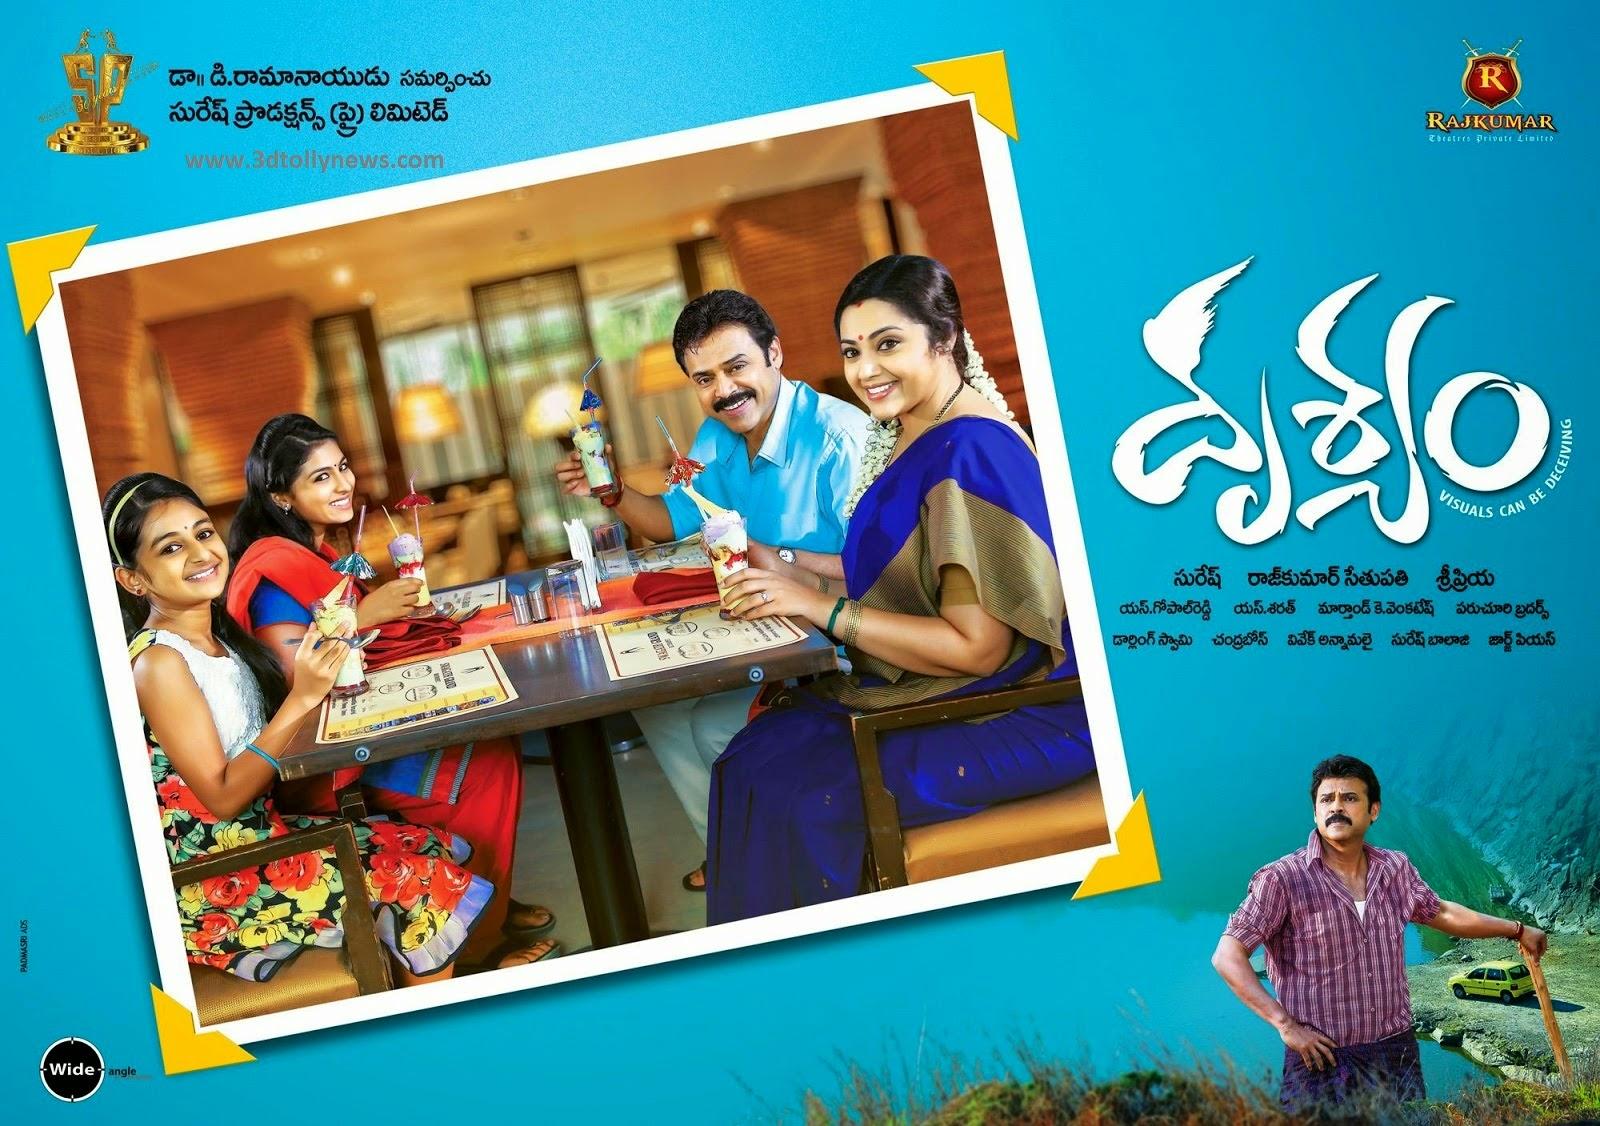 Drishyam-Movie-Latest-wallpapers